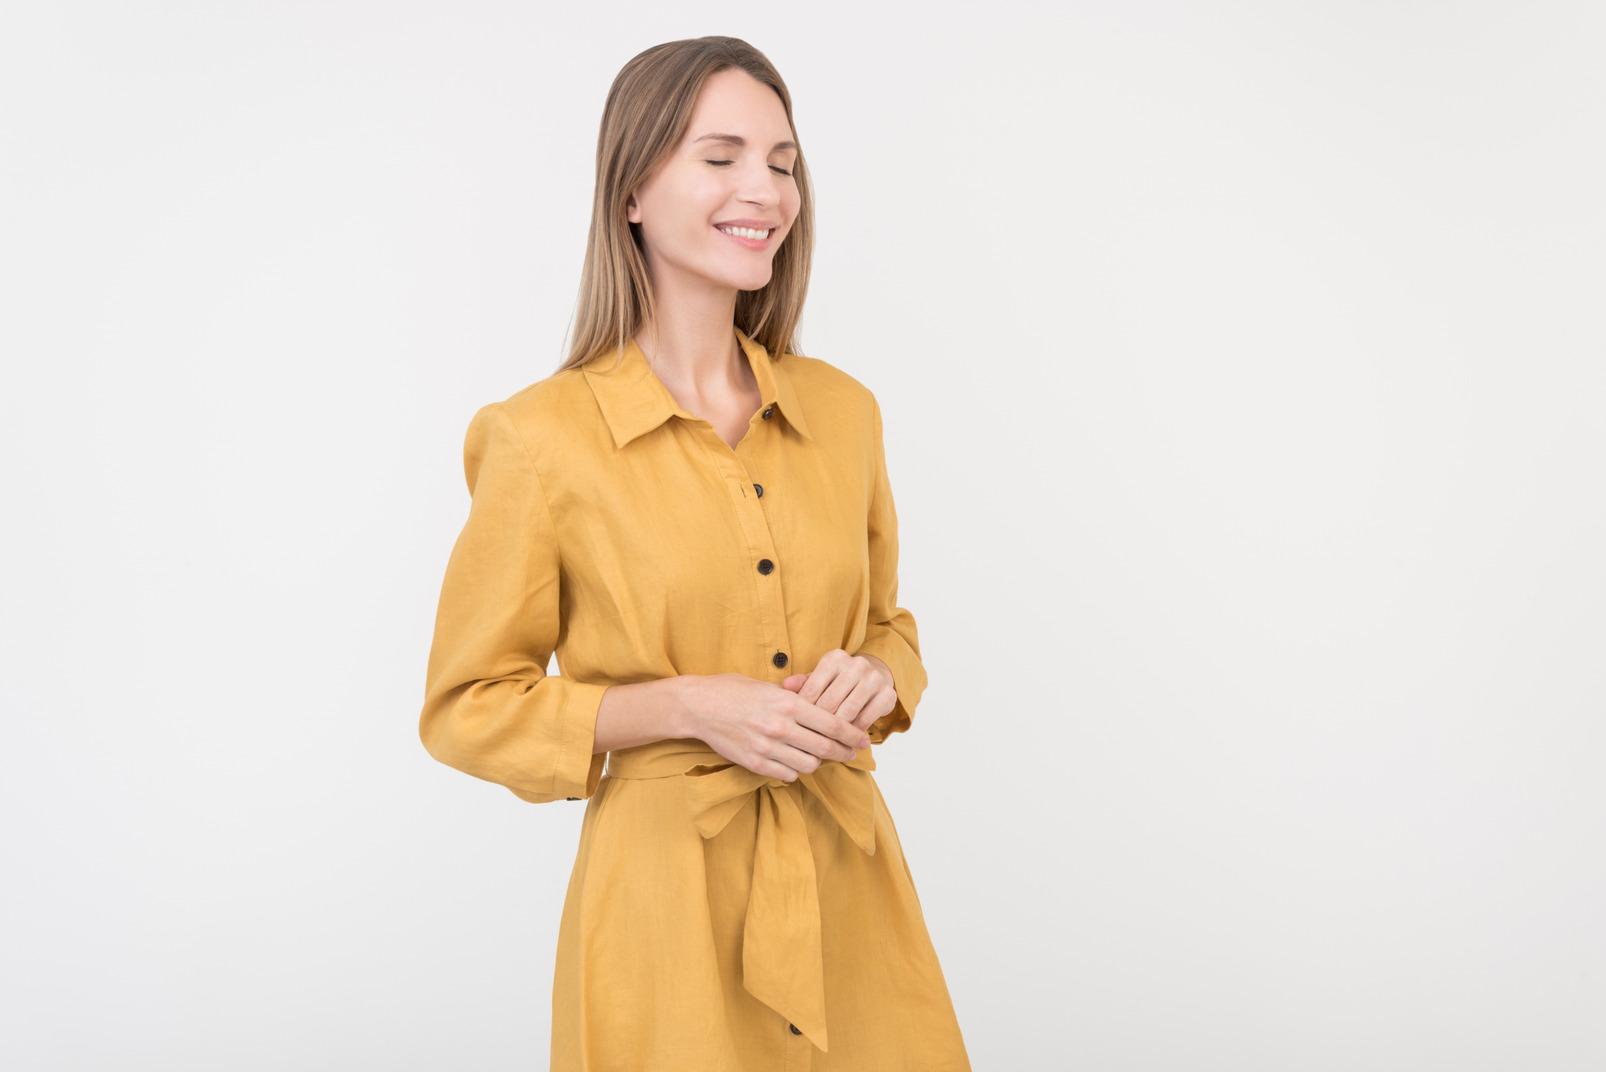 Smiling young caucasian woman in yellow dress